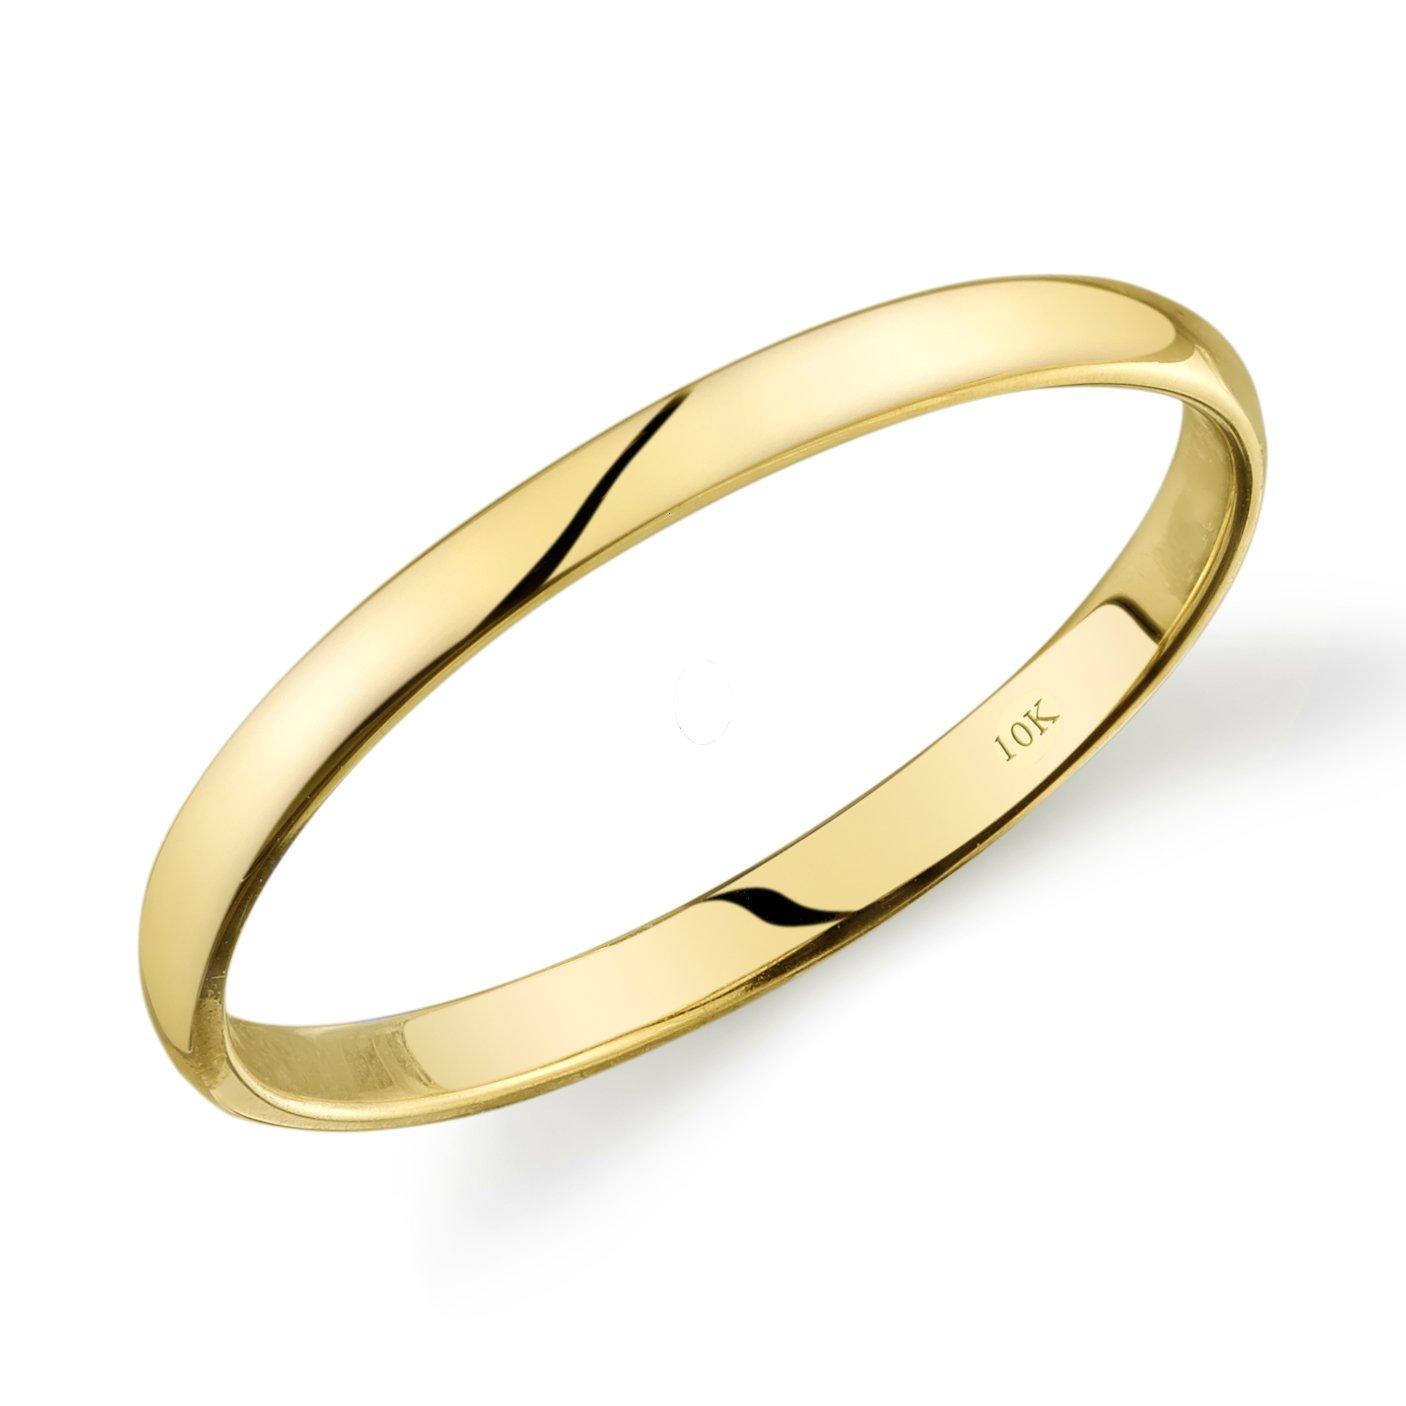 Tesori & Co 10k Yellow Gold Light Comfort Fit 2mm Wedding Band Size 7 by Tesori & Co